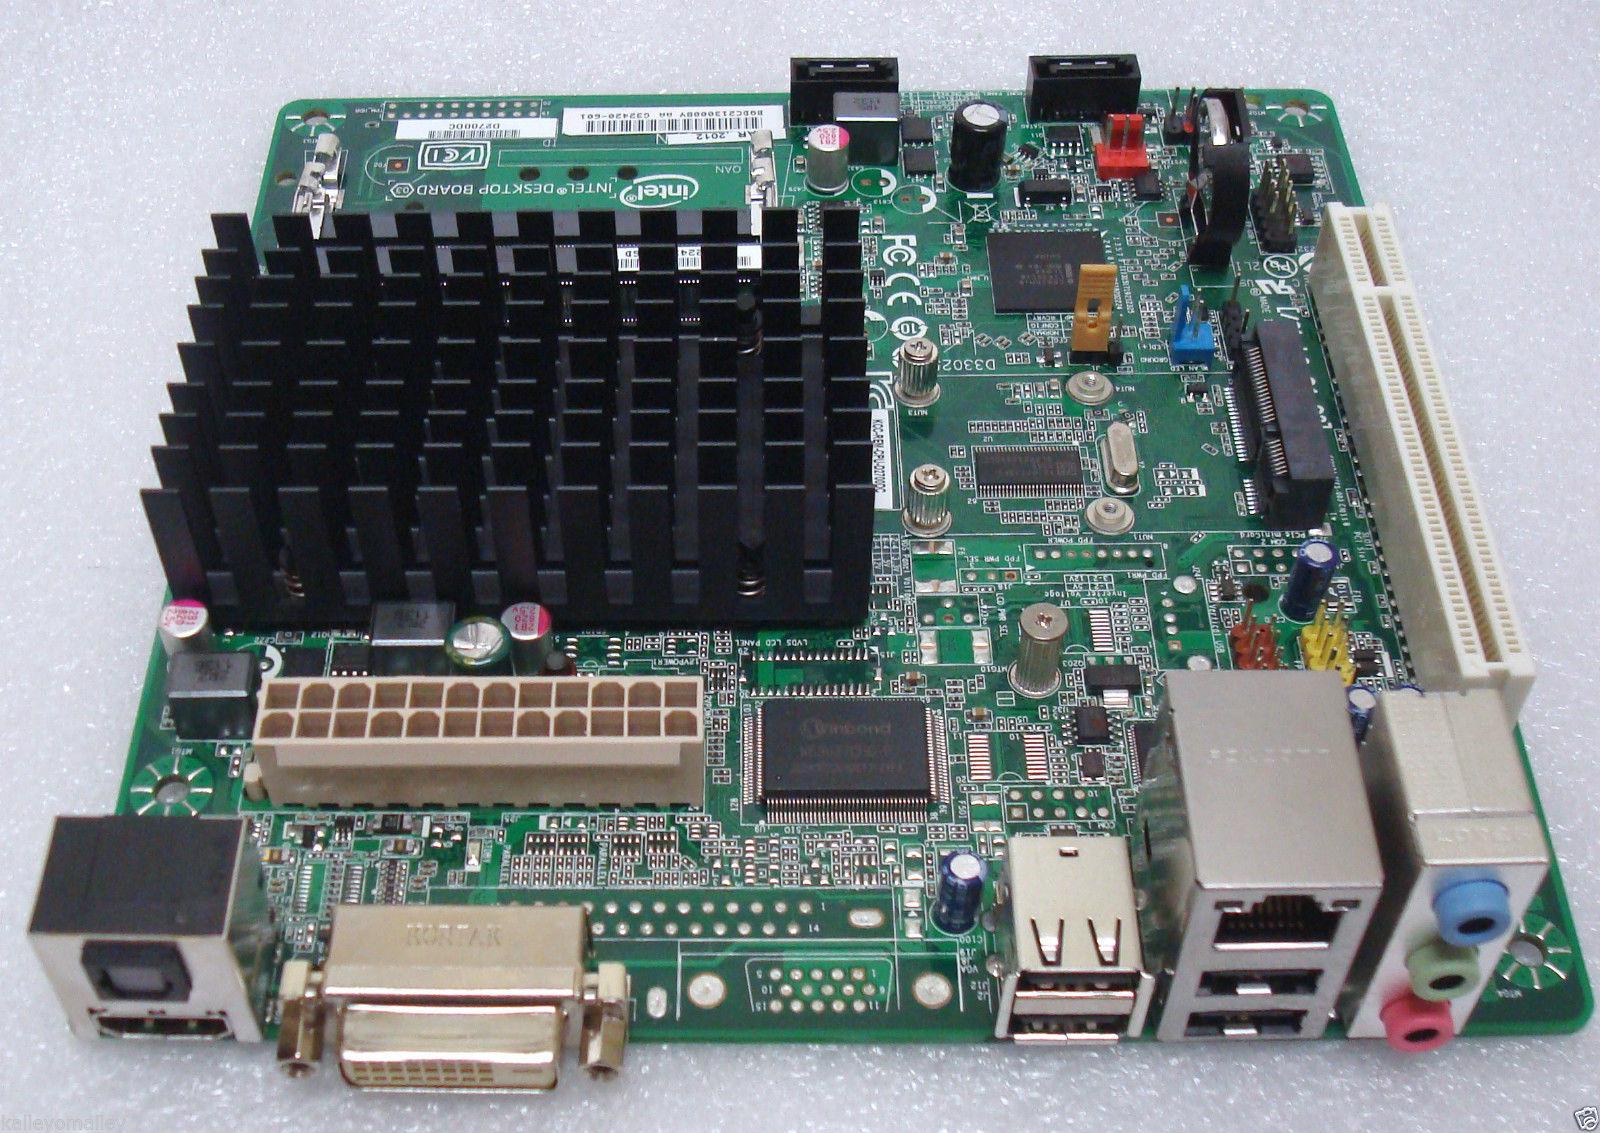 Intel D2700DC BOXD2700DC Desktop Board mITX, BGA, DDR3 ...